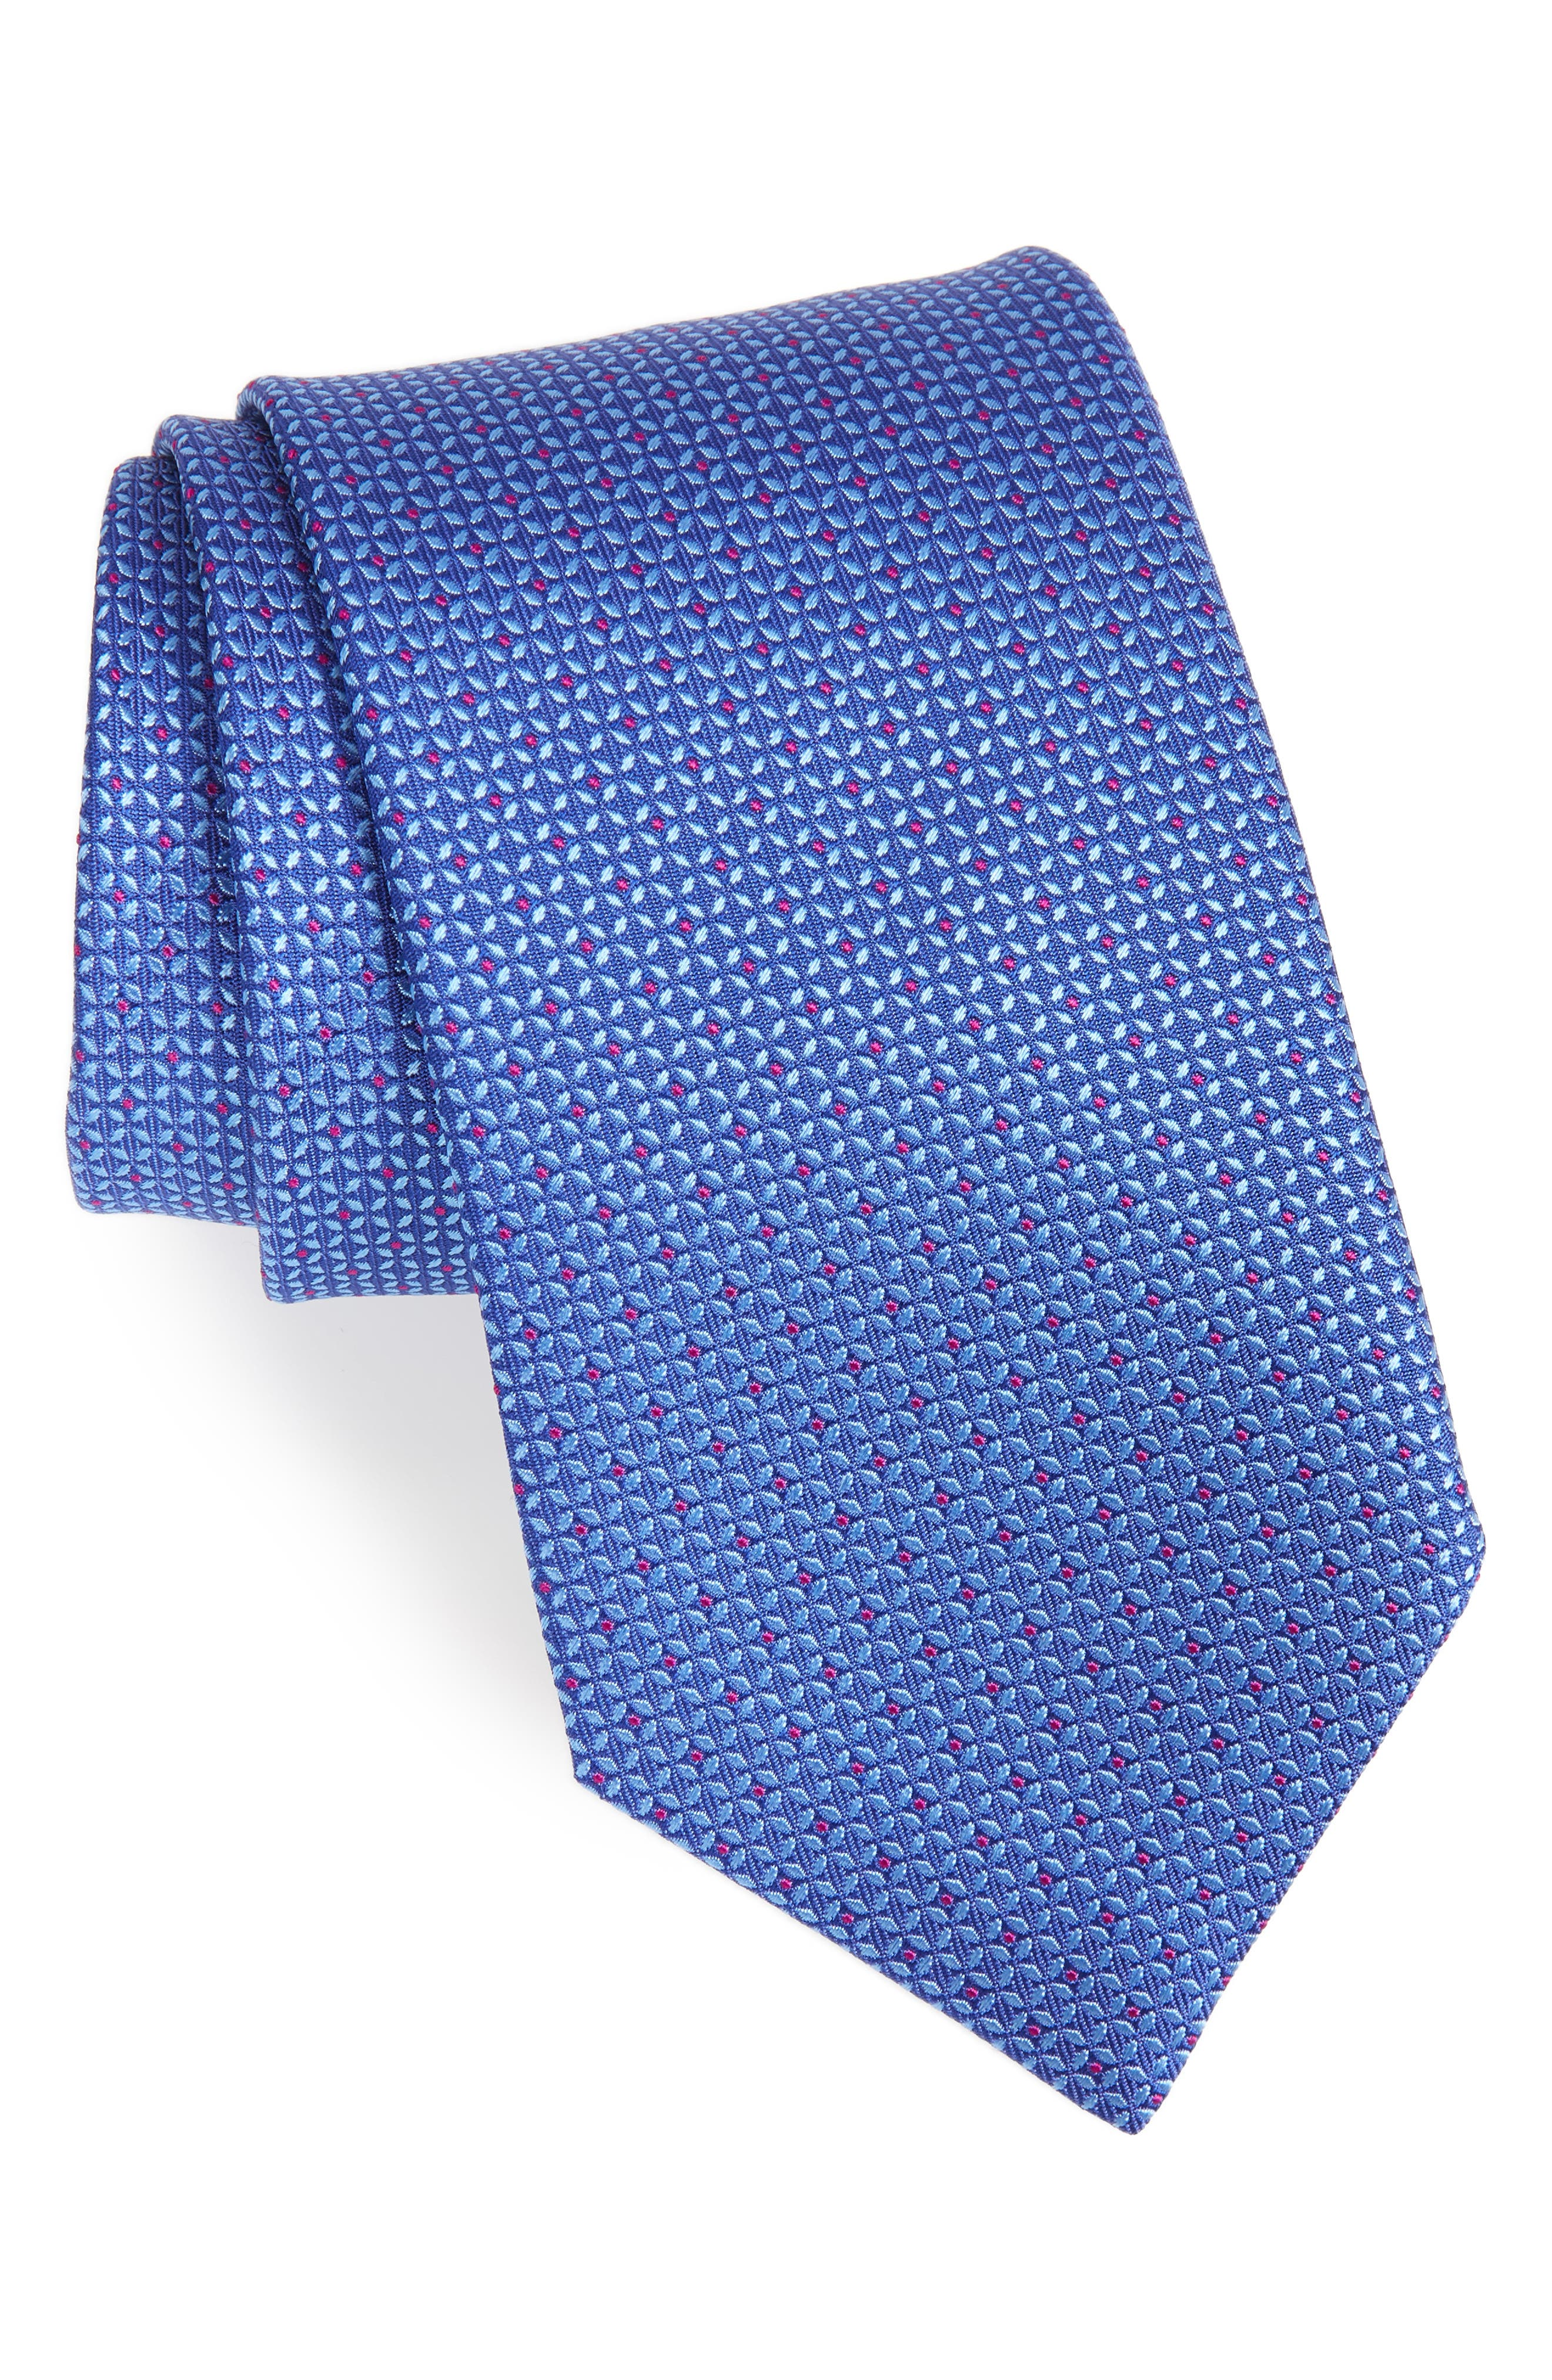 Solid Silk Tie,                             Main thumbnail 1, color,                             Blue